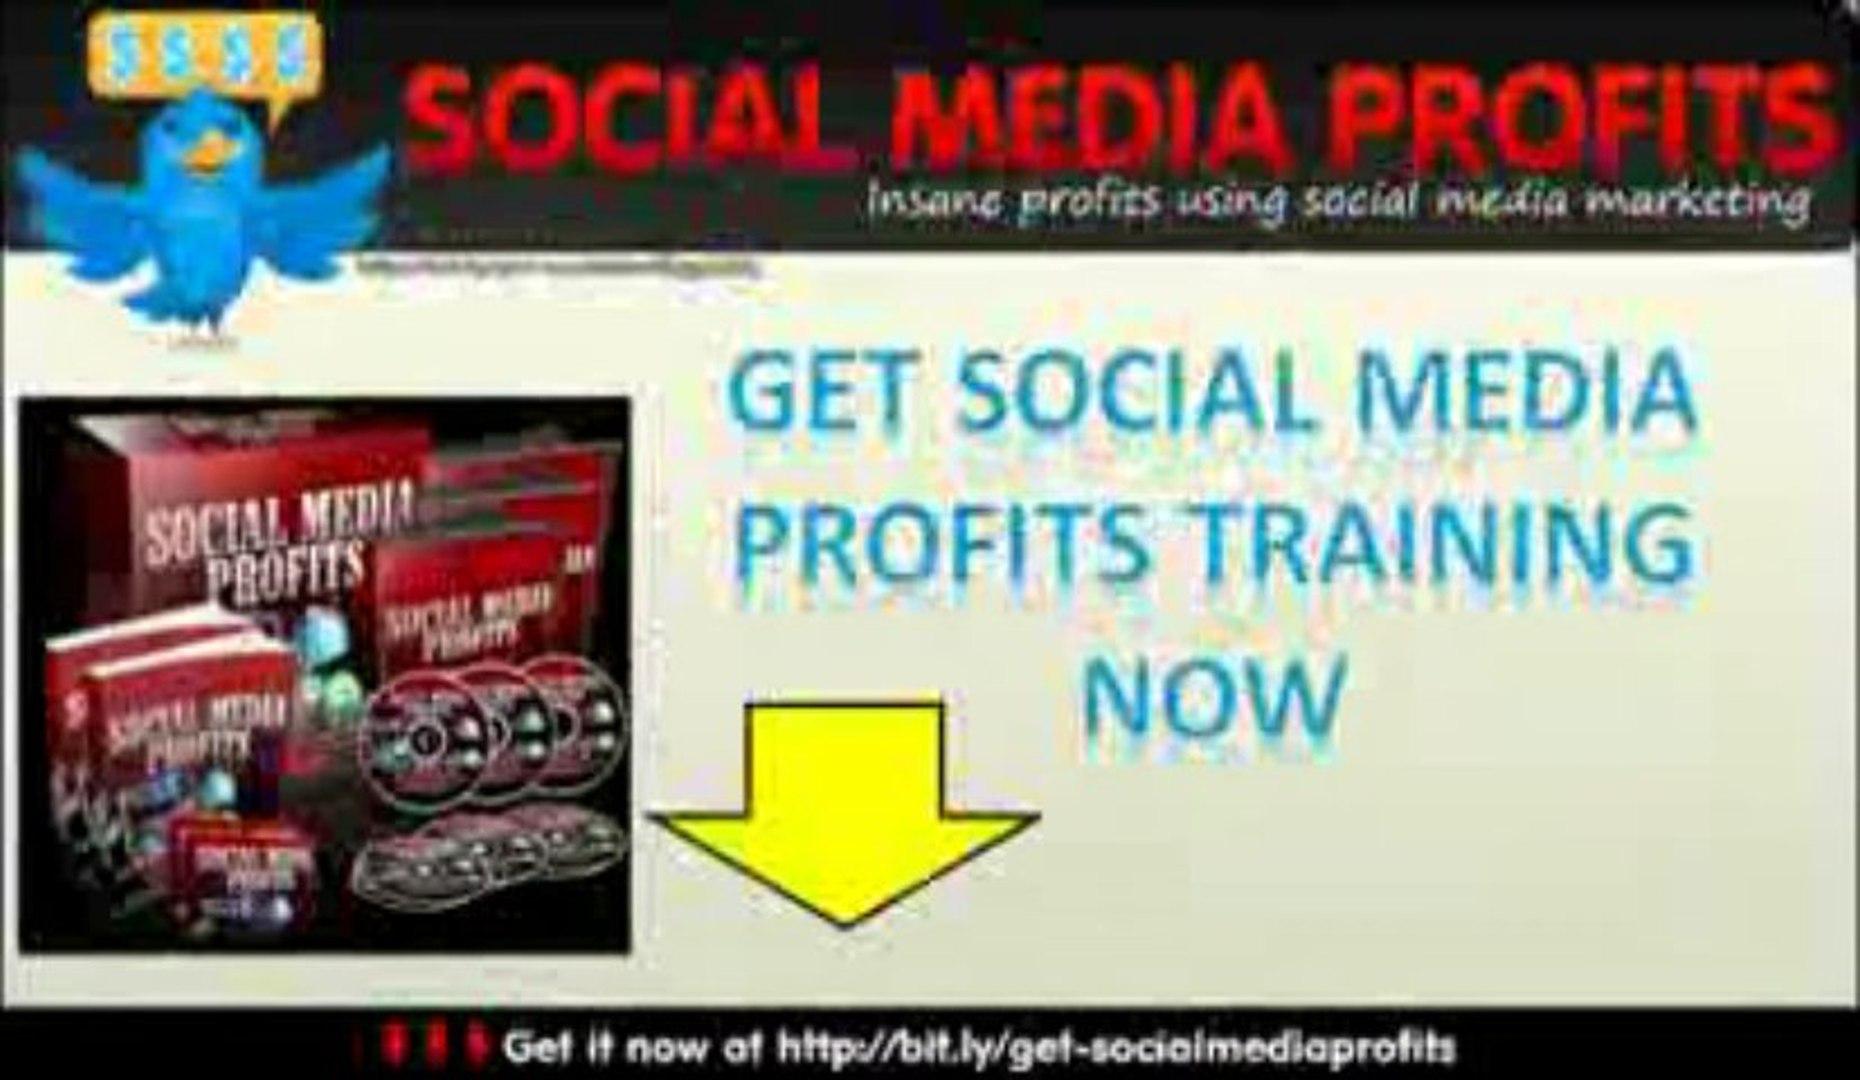 Social Media Profits | Social Media Profits